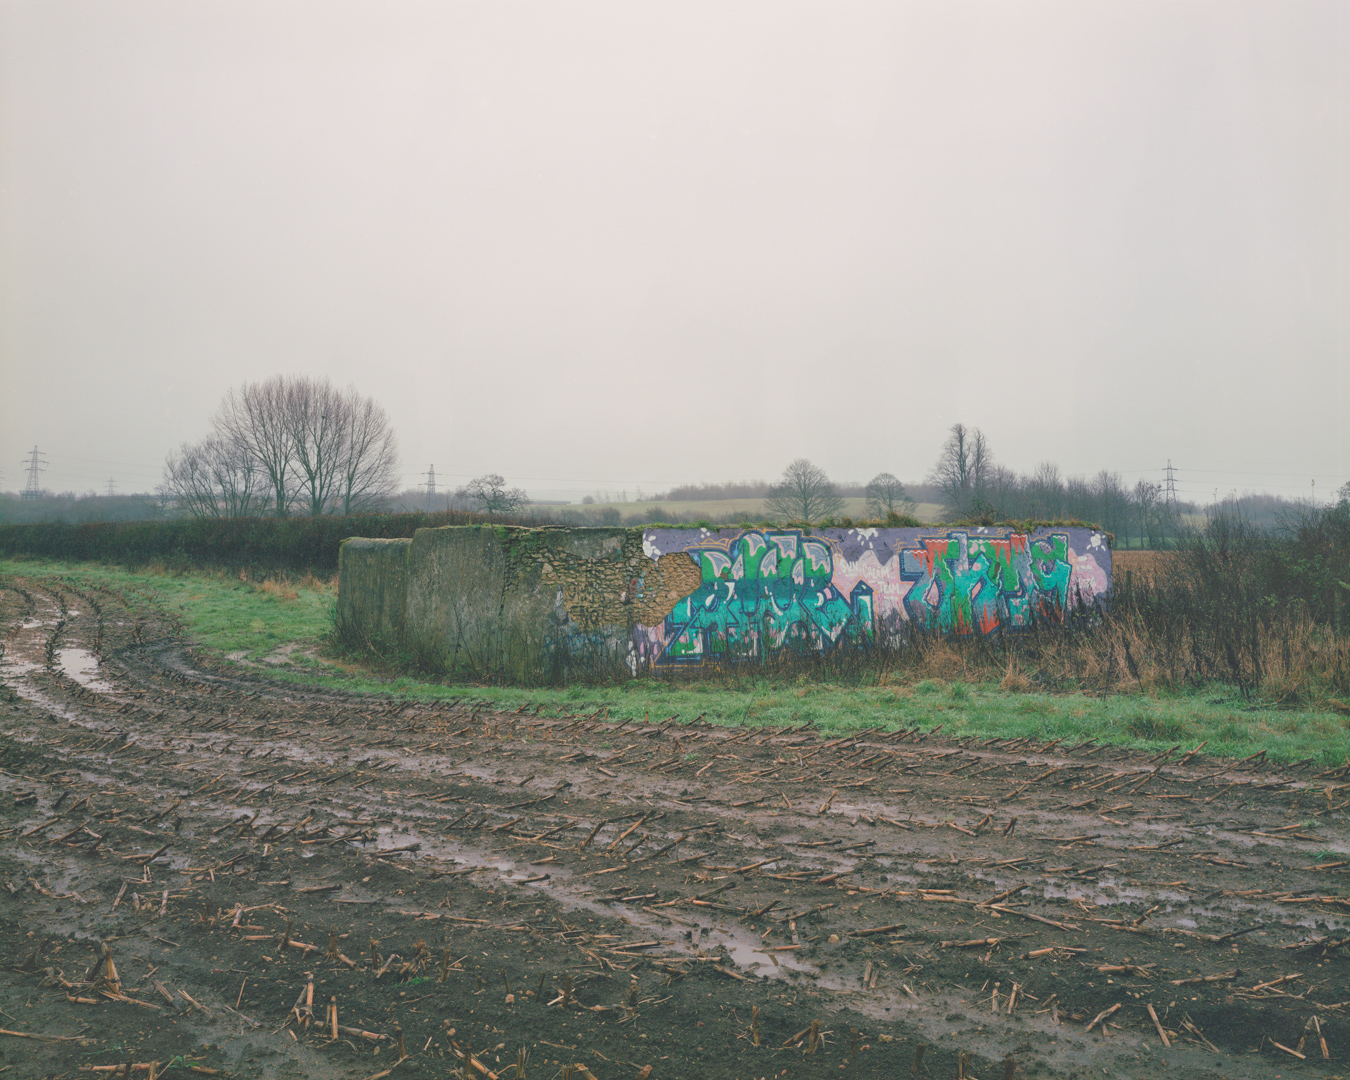 Abandoned Outfarm, Lydiard Tregoze, 2016